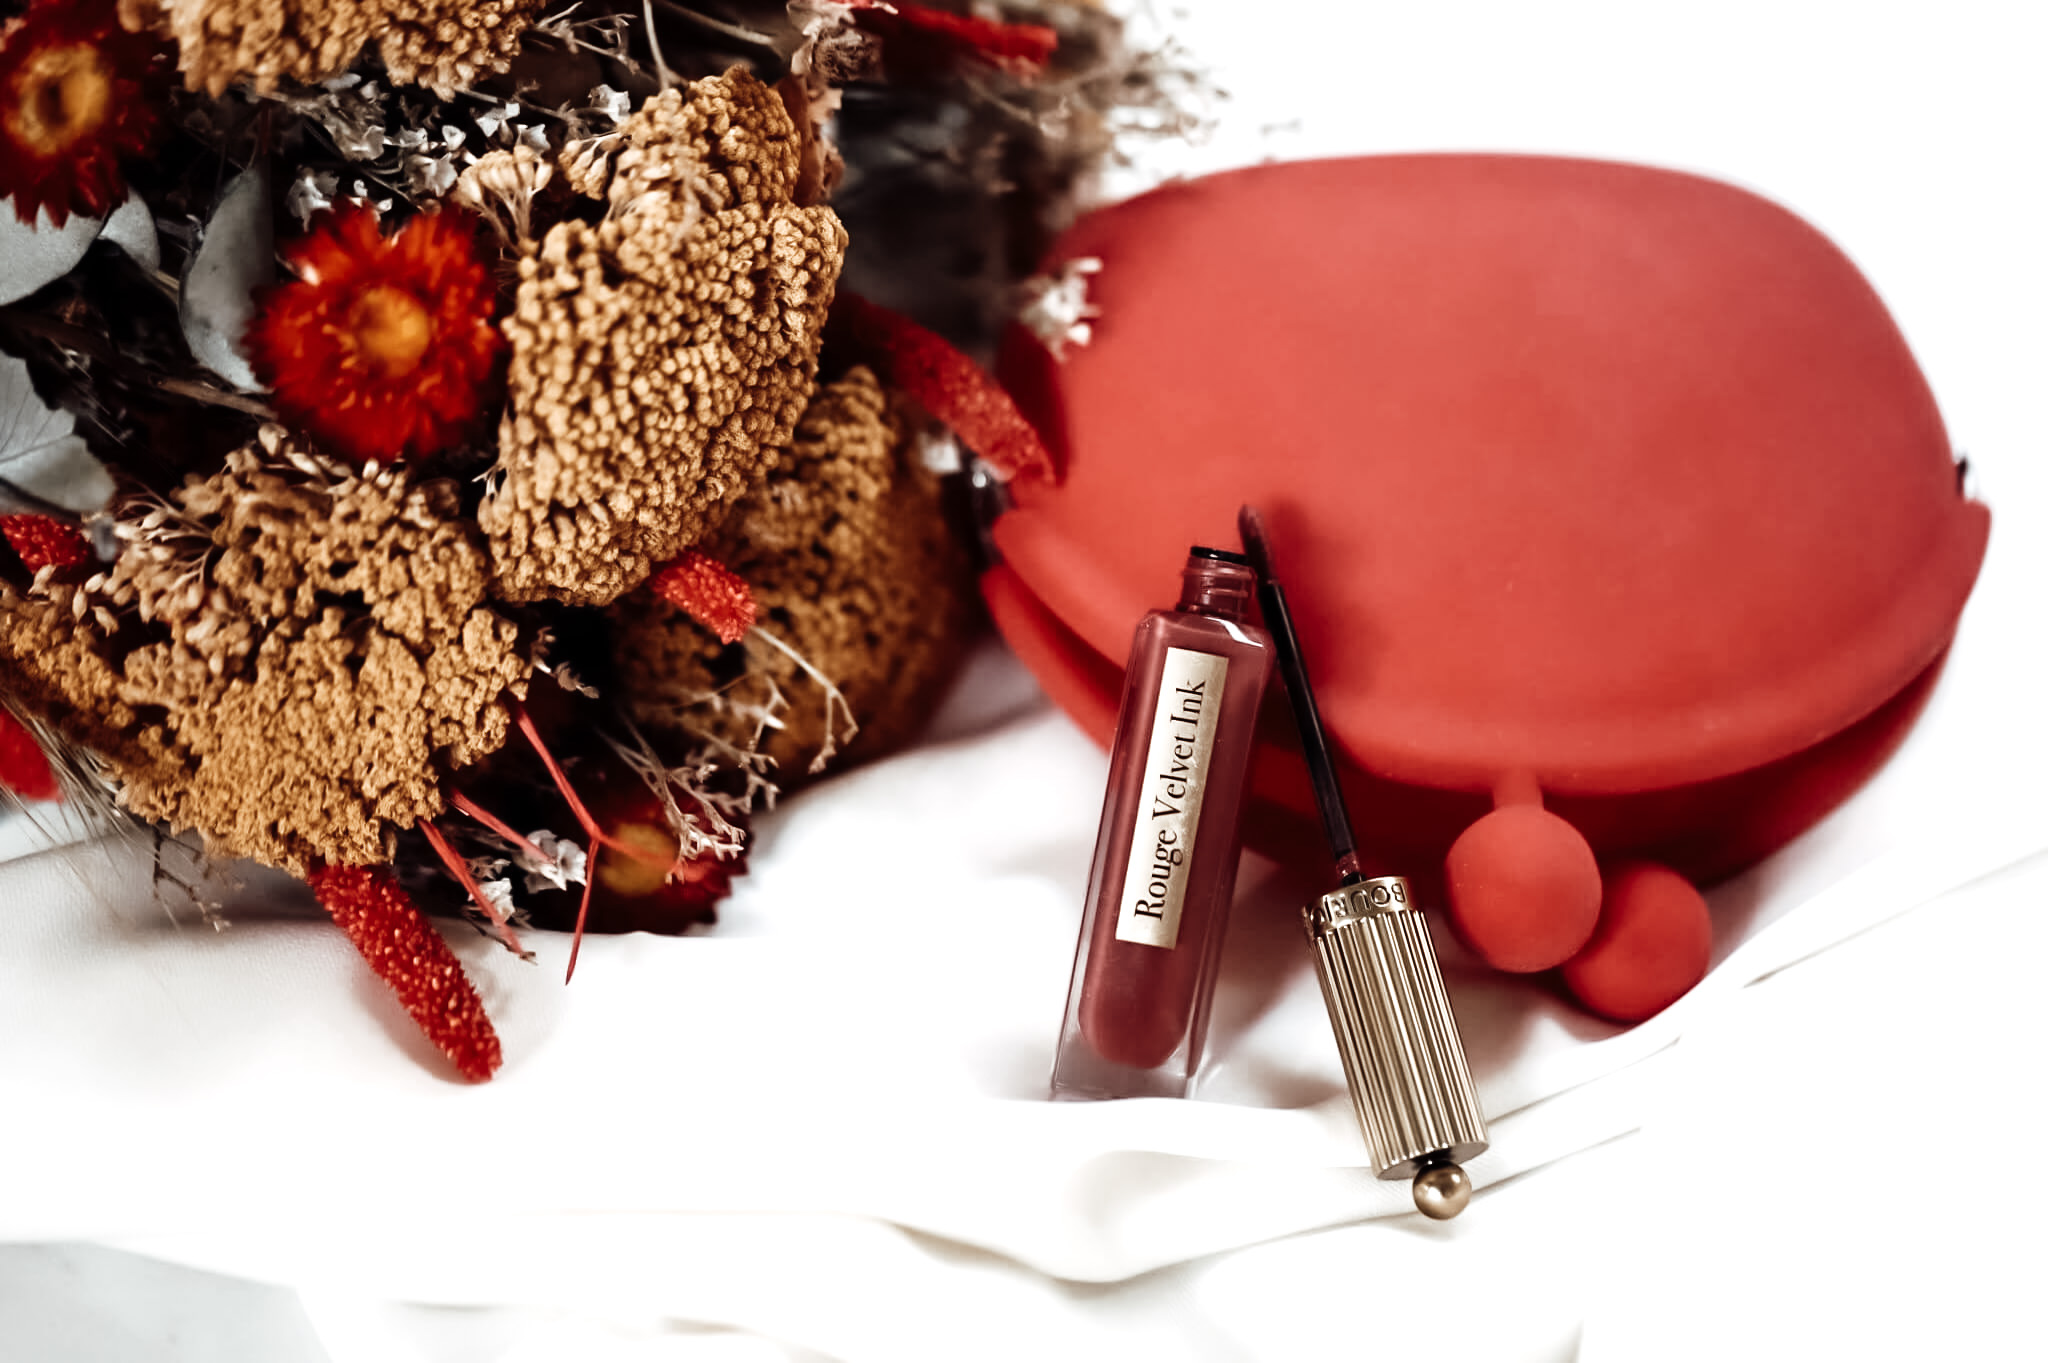 Bourjois Rouge Velvet Ink